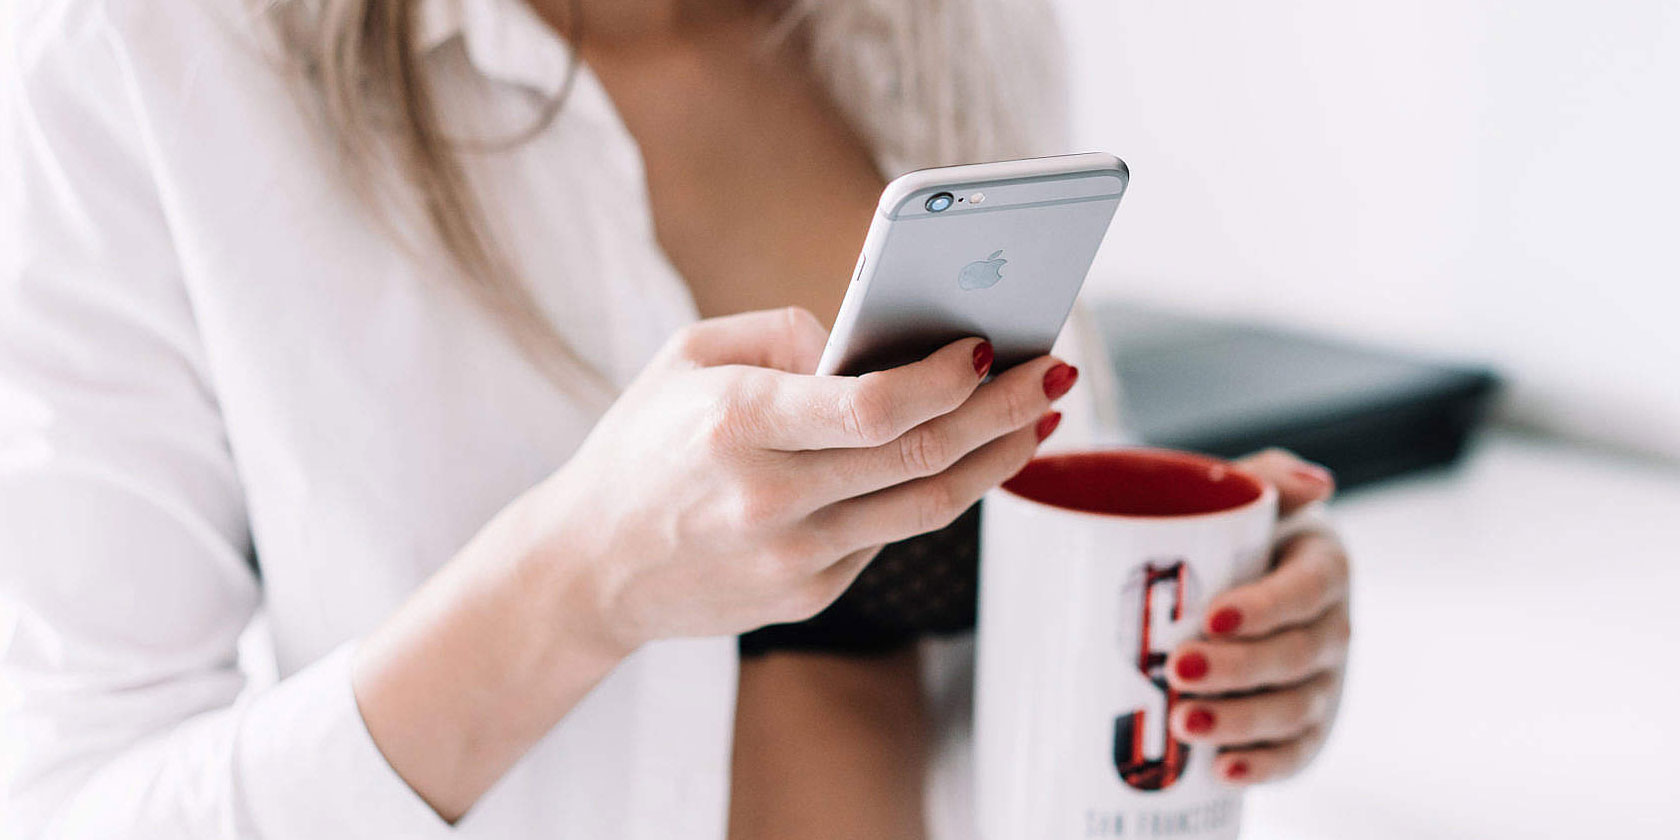 iphone-ipad-update-issues